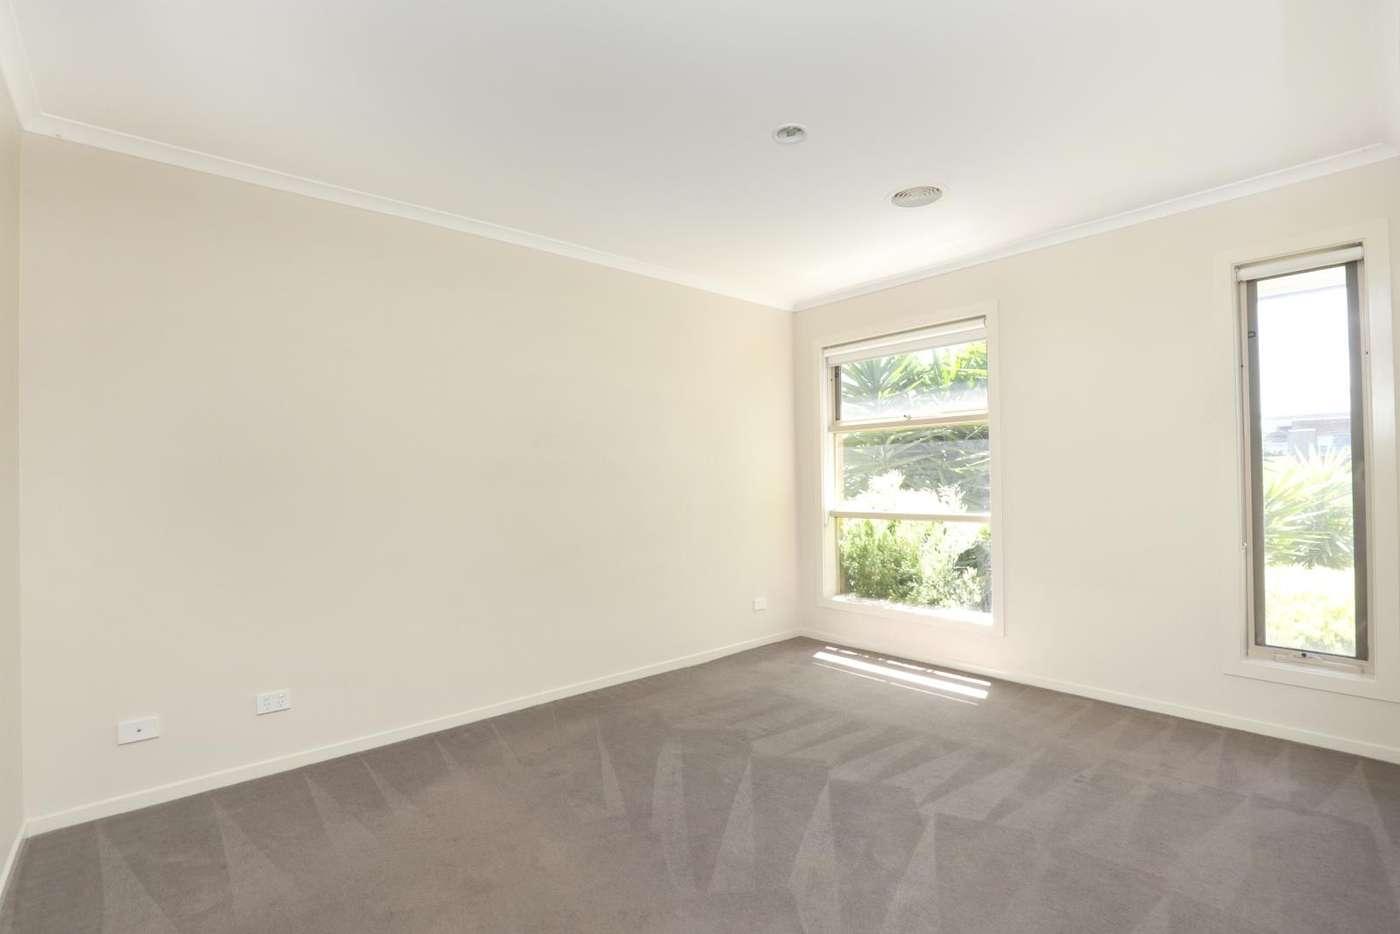 Sixth view of Homely house listing, 5 Narmara Mews, Wyndham Vale VIC 3024